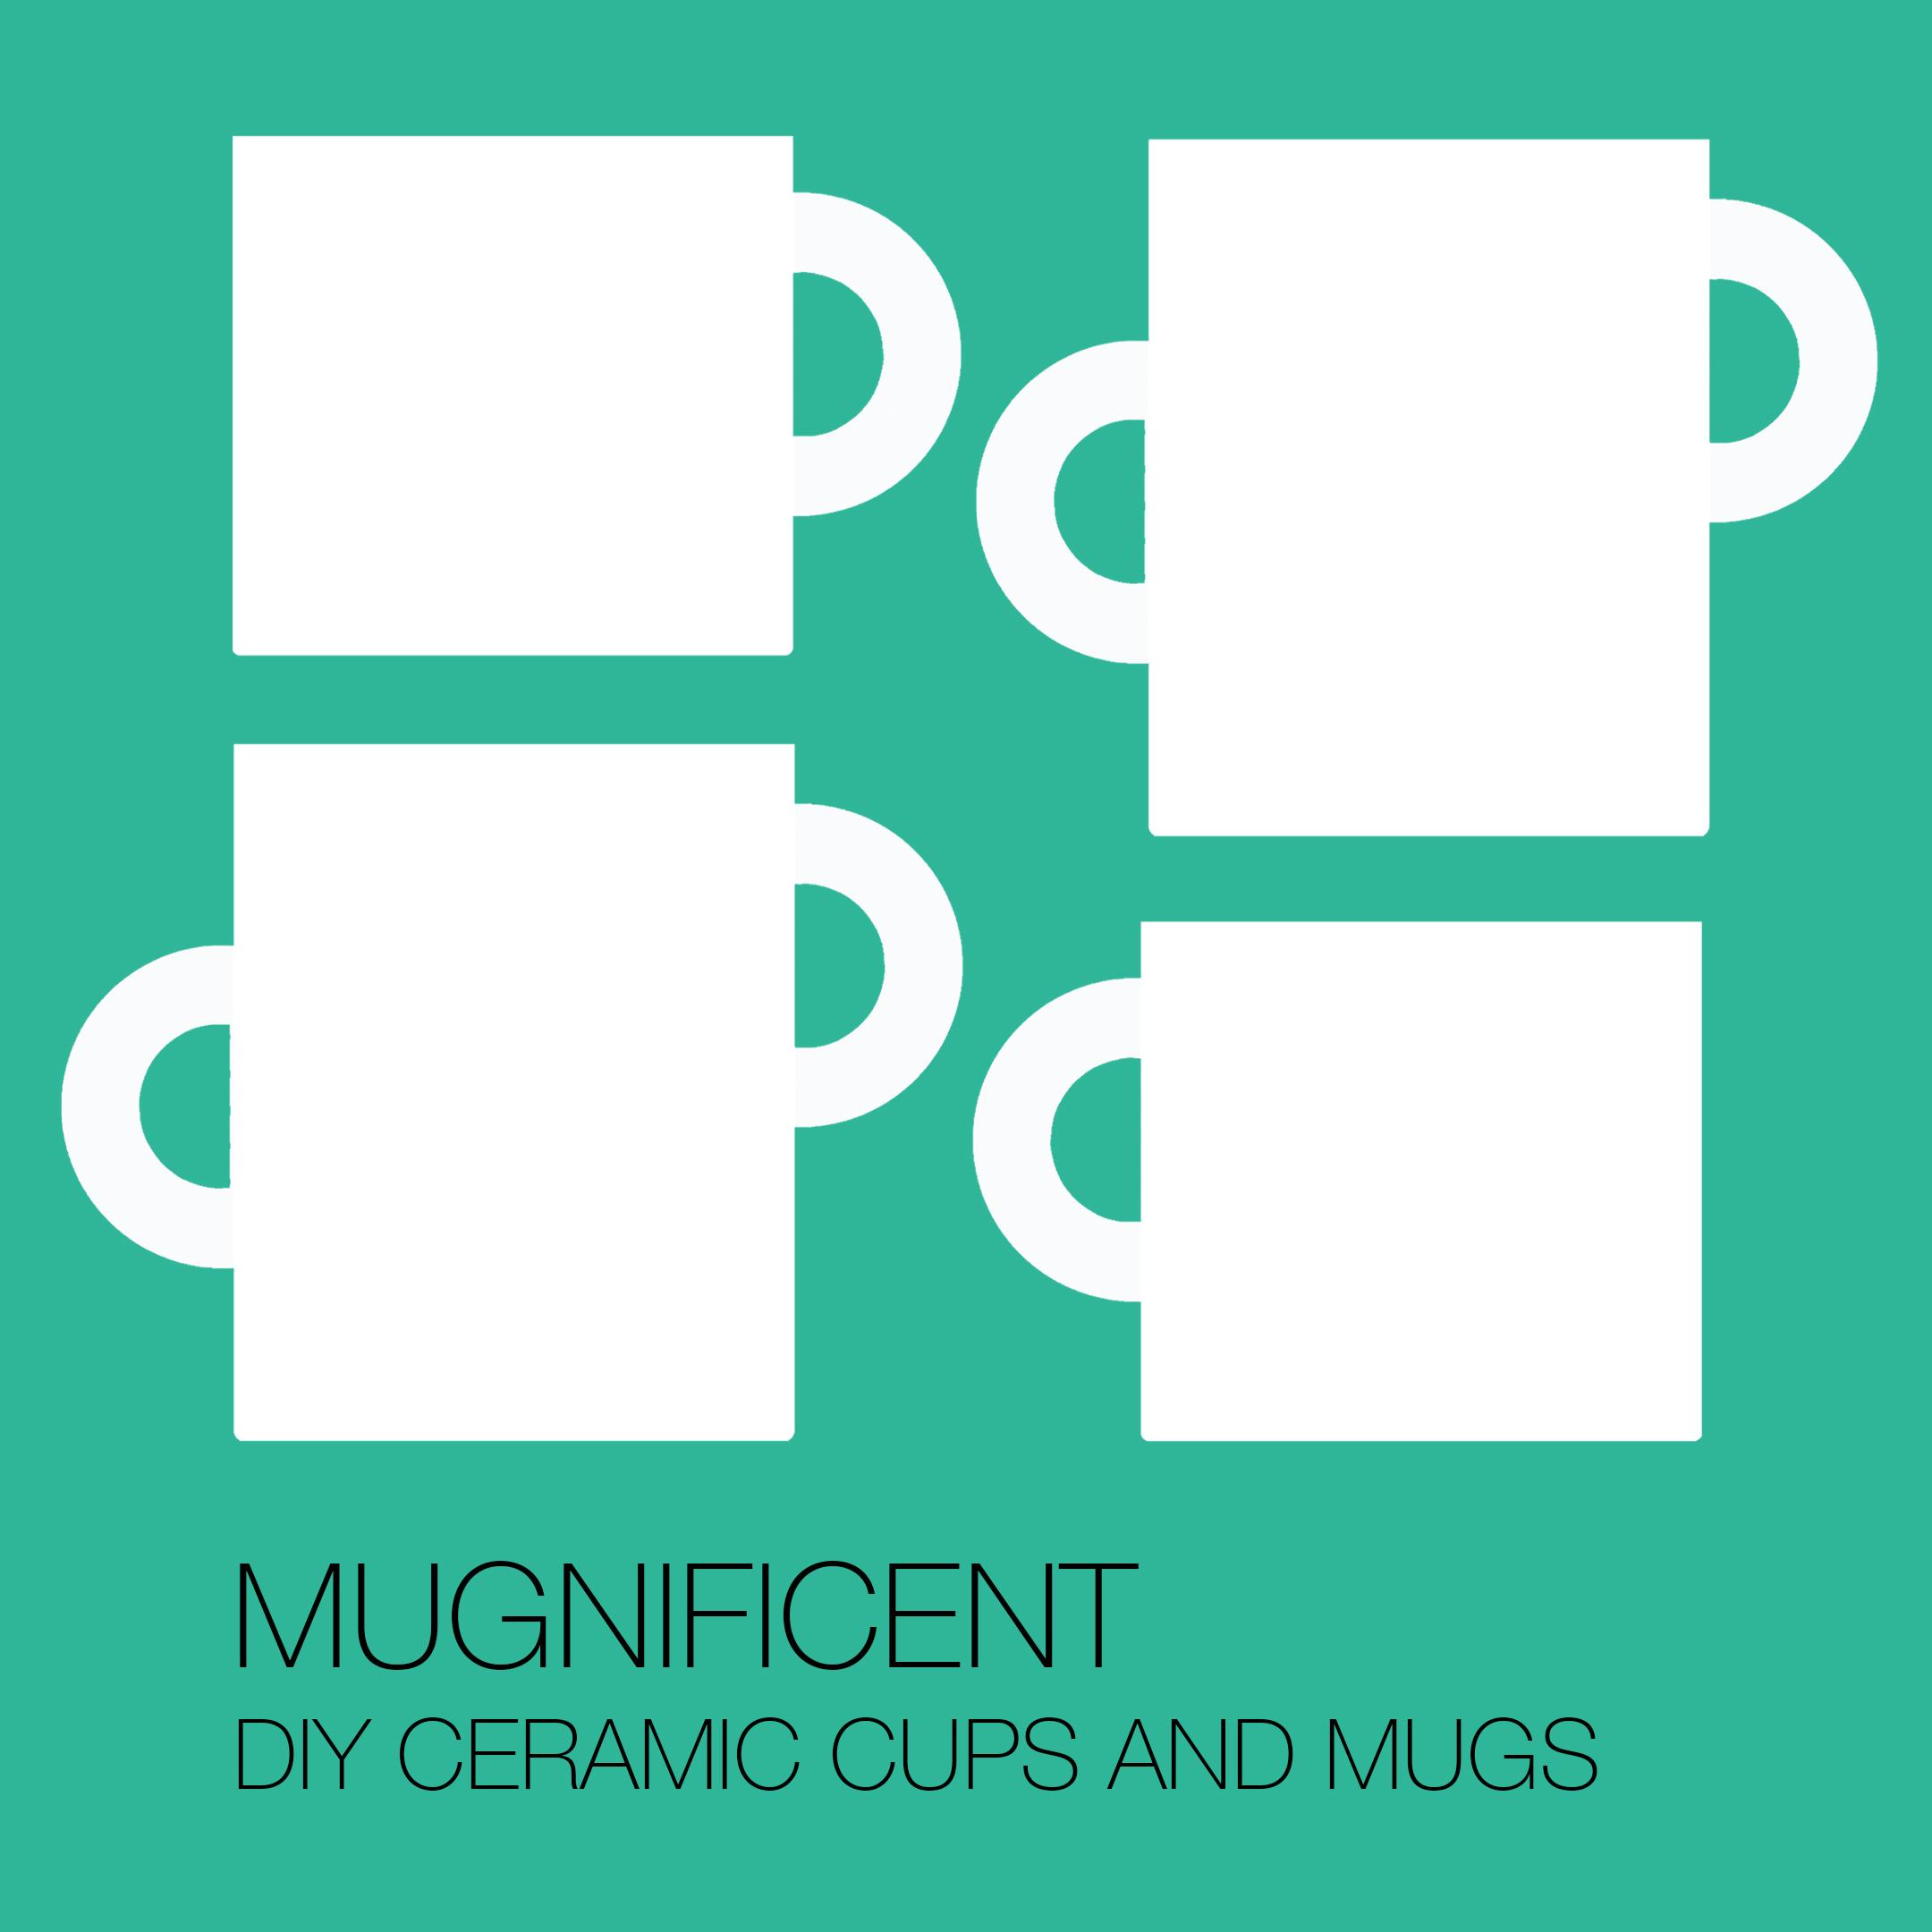 MUGNIFICENT // DIY Ceramic Mugs and Cups Image #0